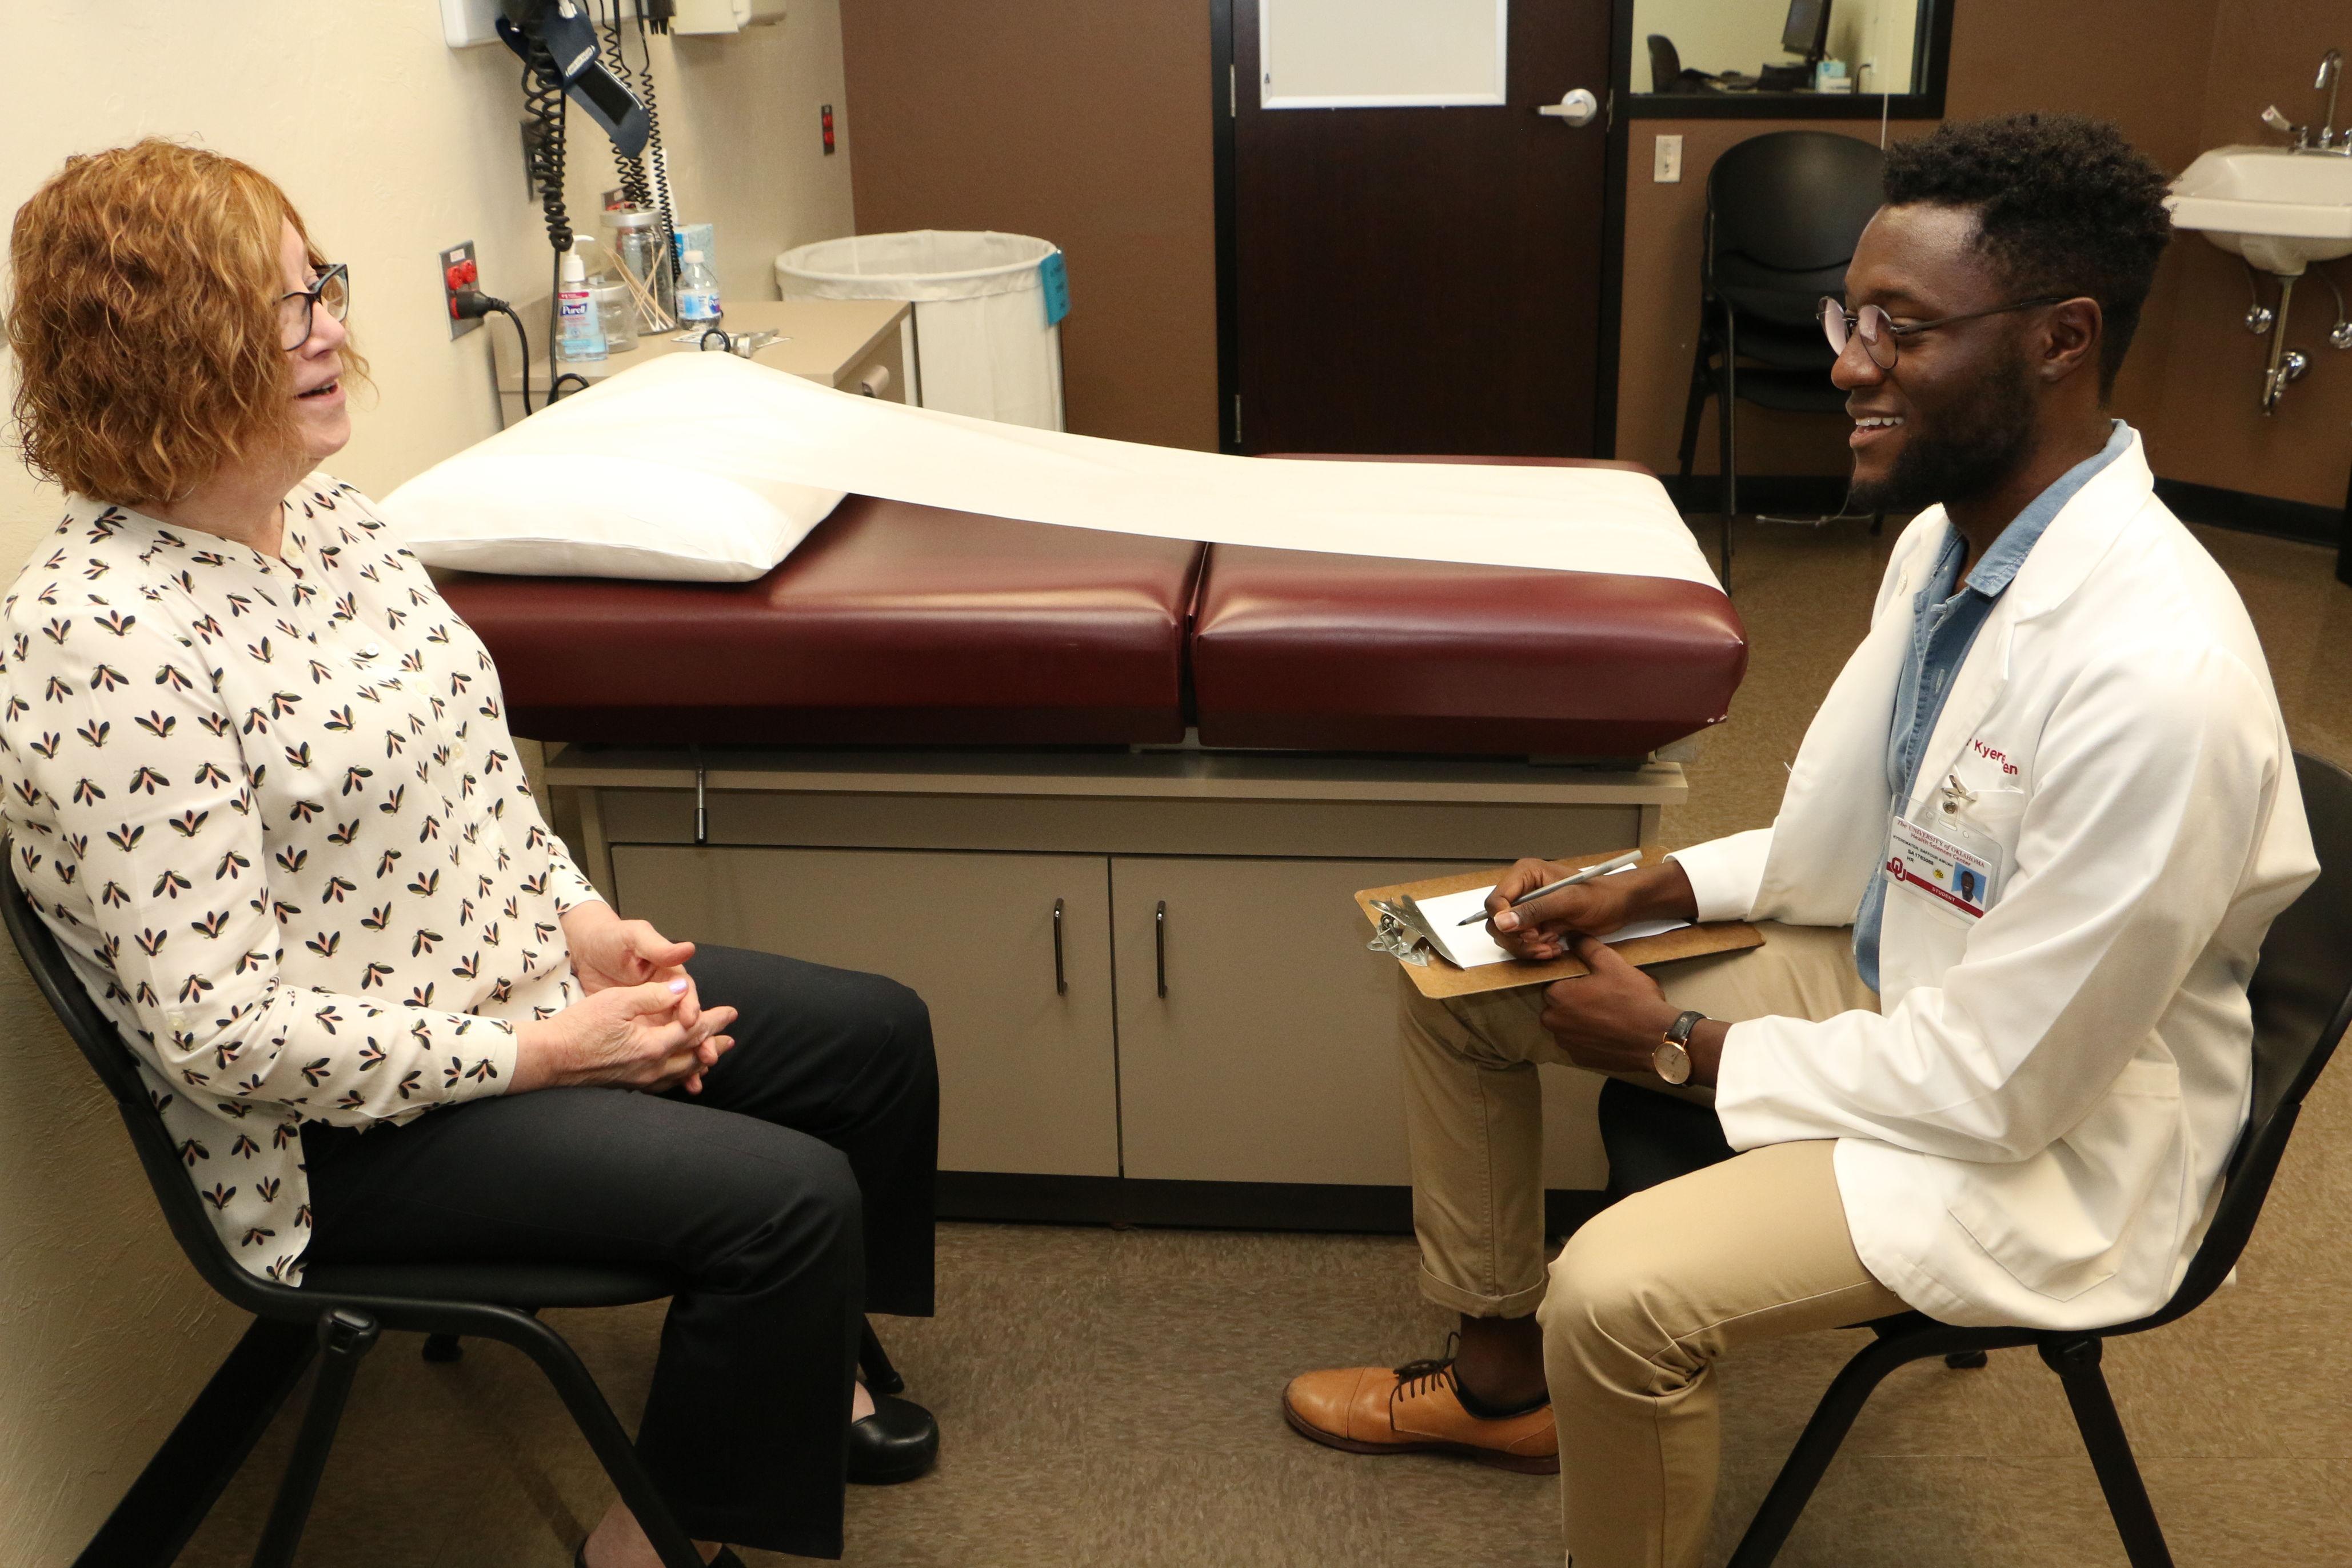 Medical school creates program for treating LGBTQ patients